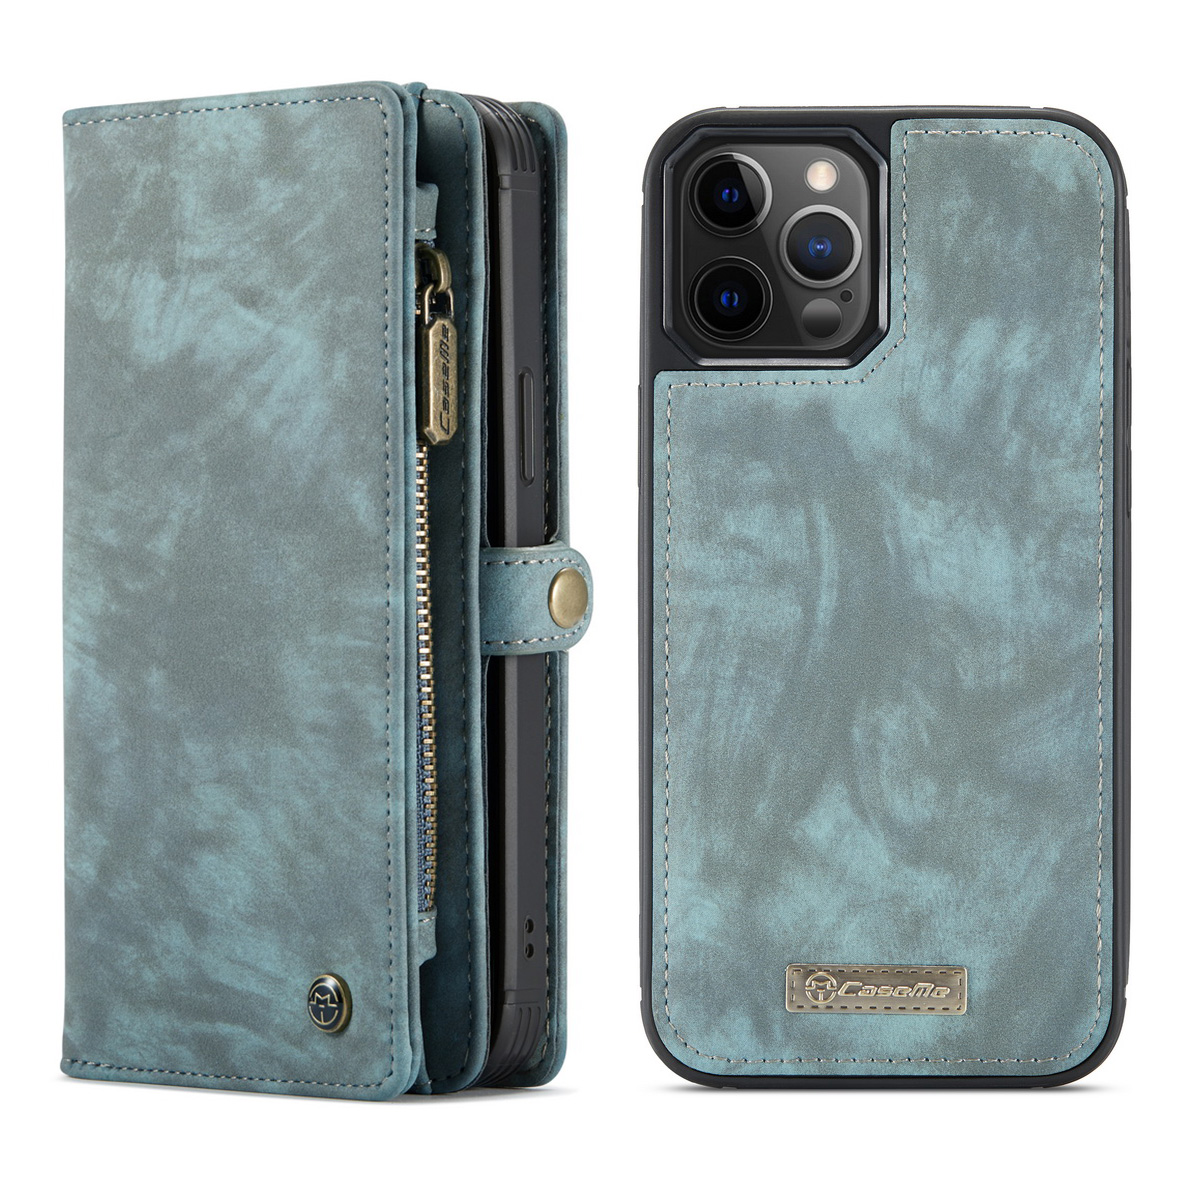 CaseMe 008 Series läderfodral, iPhone 12 Pro Max, blå